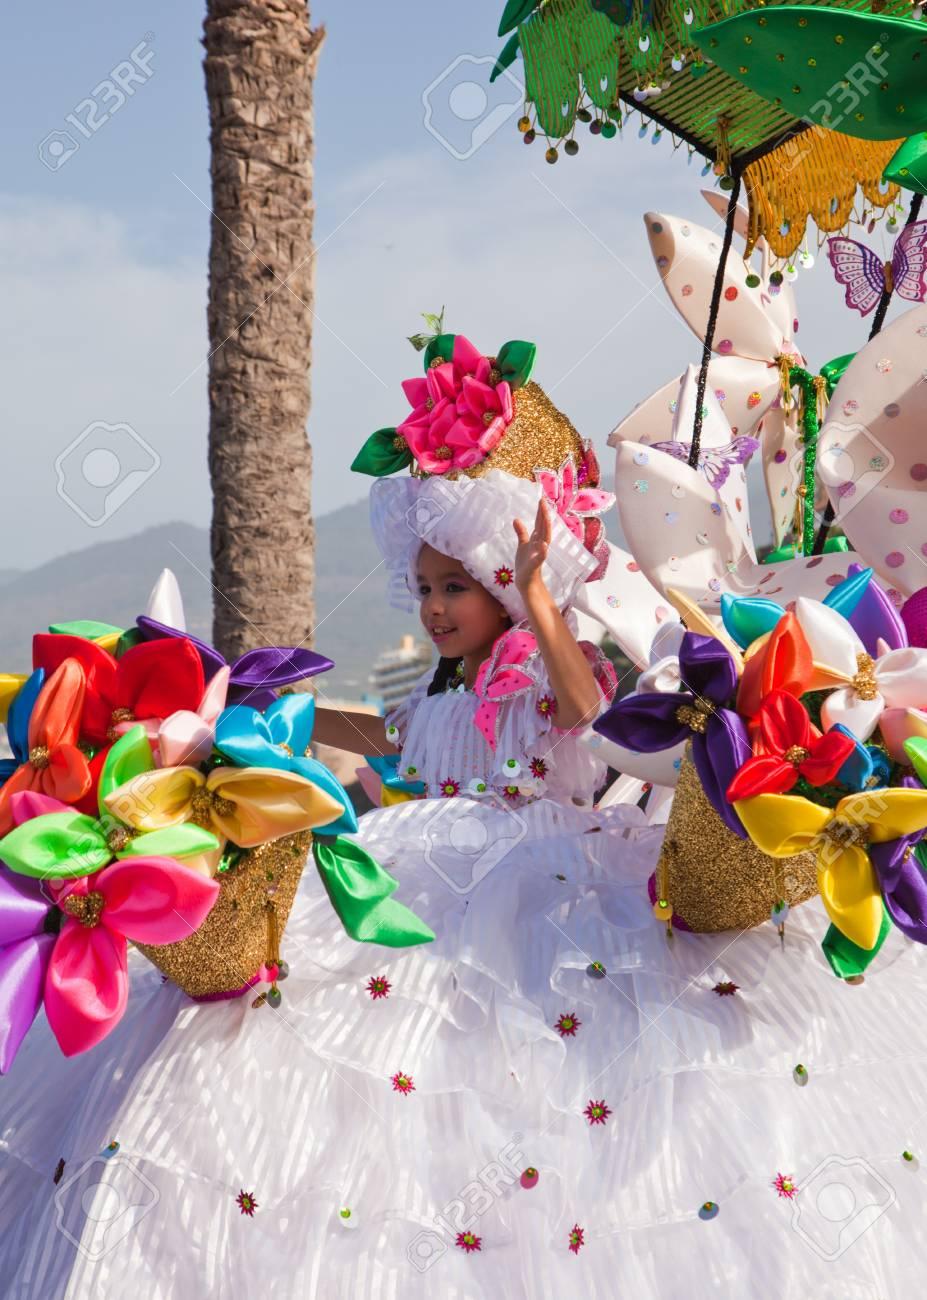 PUERTO DE LA CRUZ, SPAIN - February 16: Colorfully dressed participants take part in main carnival parade on February 16, 2013 in Puerto de la Cruz, Tenerife, Spain Stock Photo - 18471351